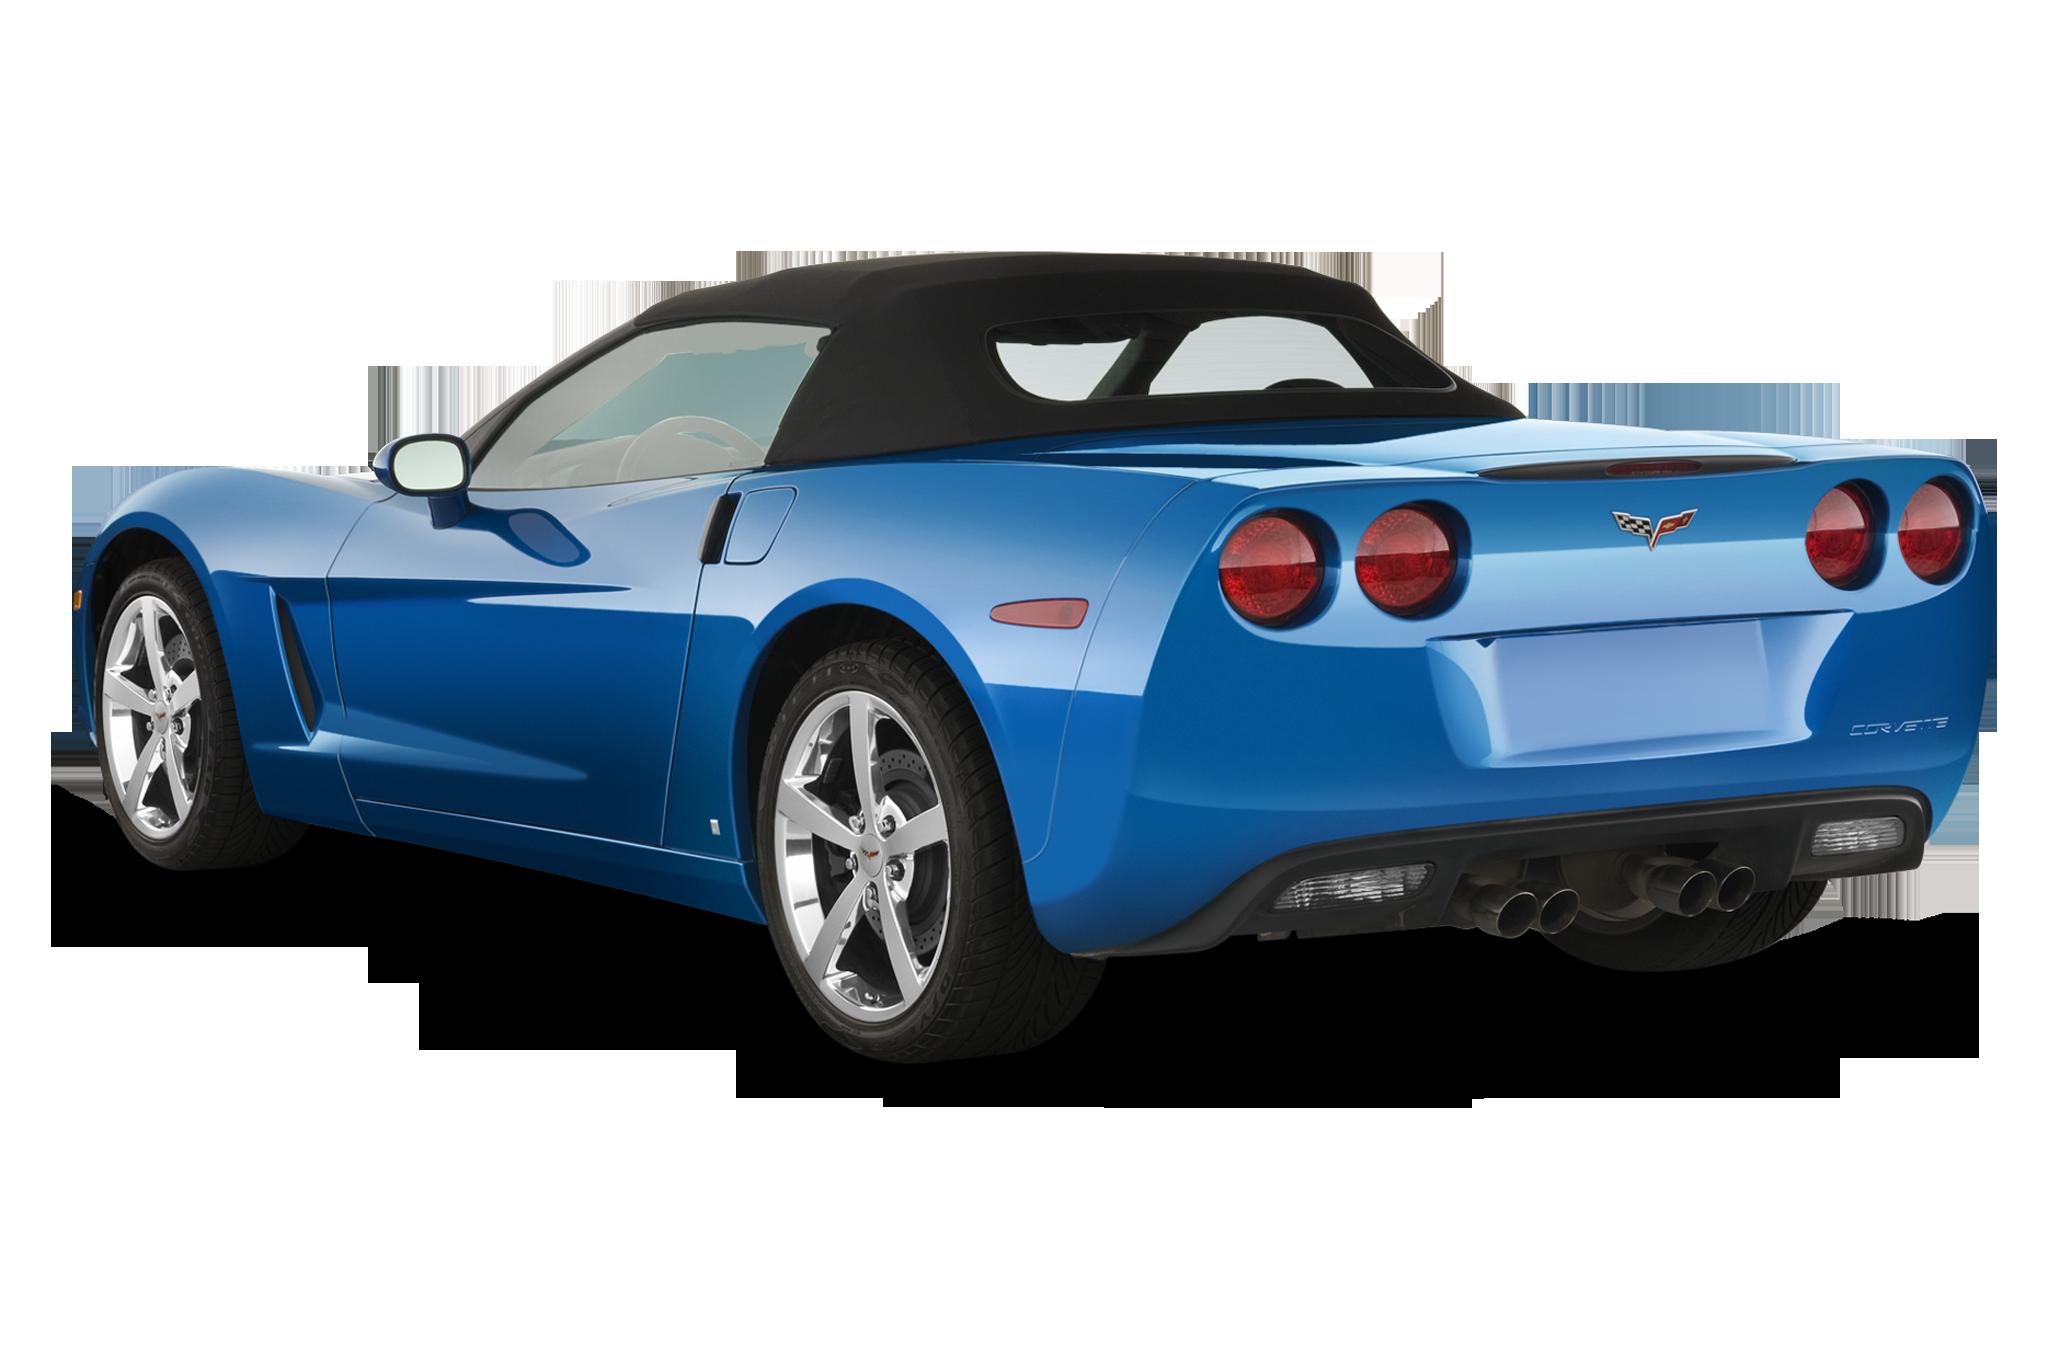 2010 chevrolet corvette grand sport chevy sport coupe review automobile magazine. Black Bedroom Furniture Sets. Home Design Ideas